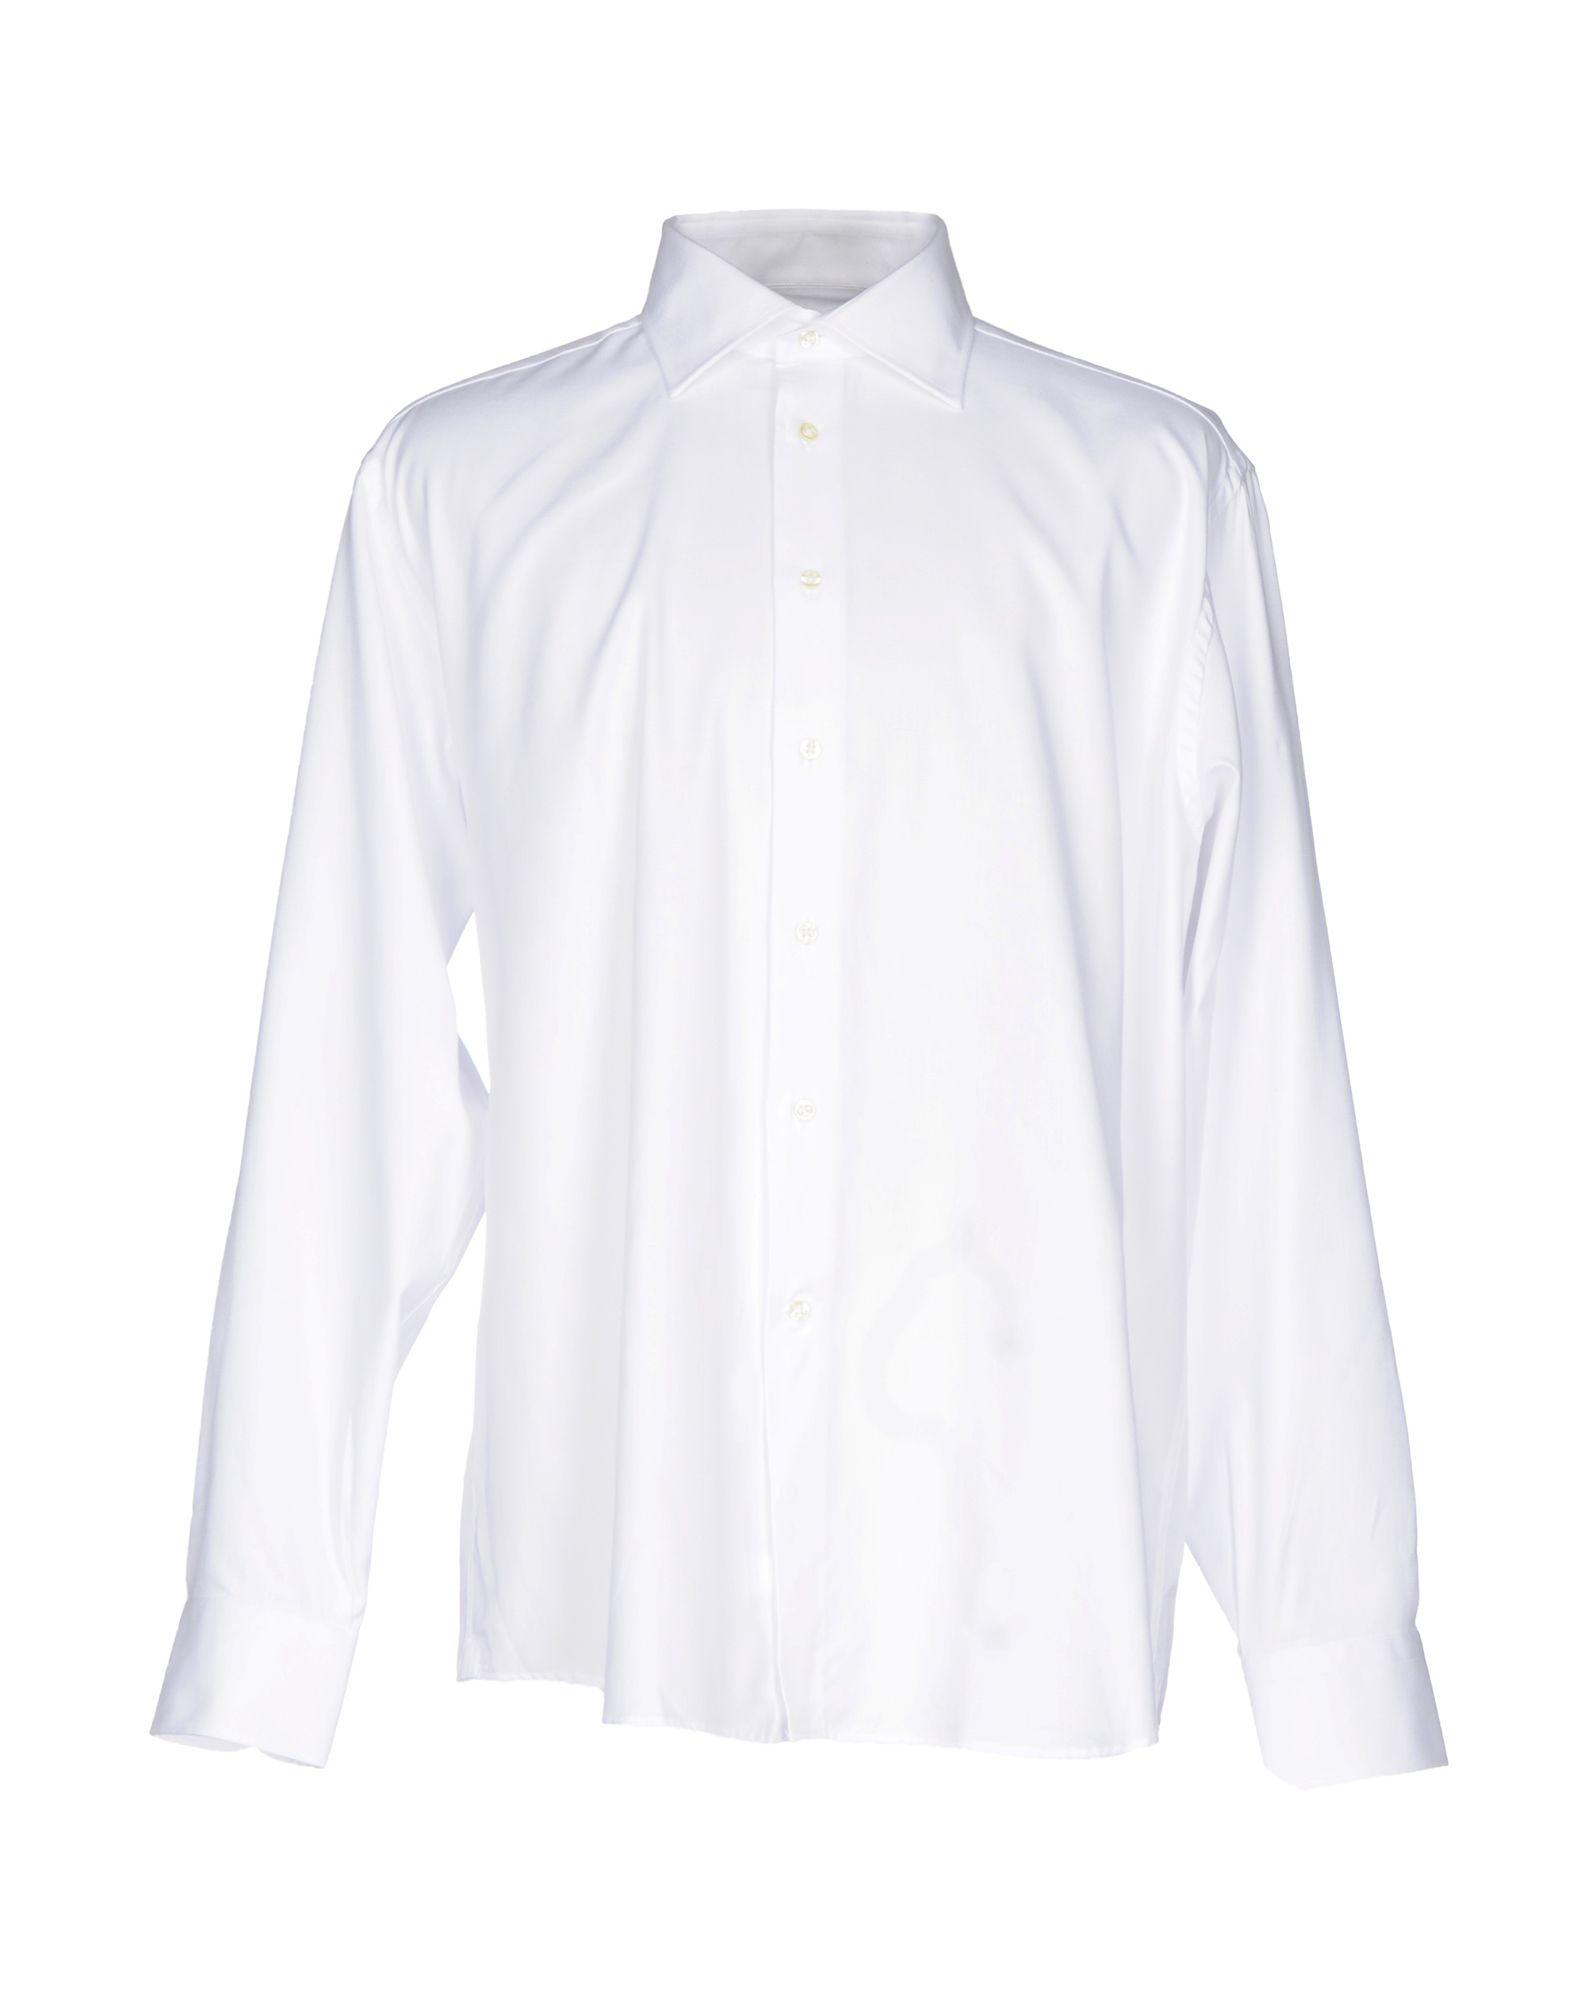 все цены на HENRY SMITH Pубашка в интернете